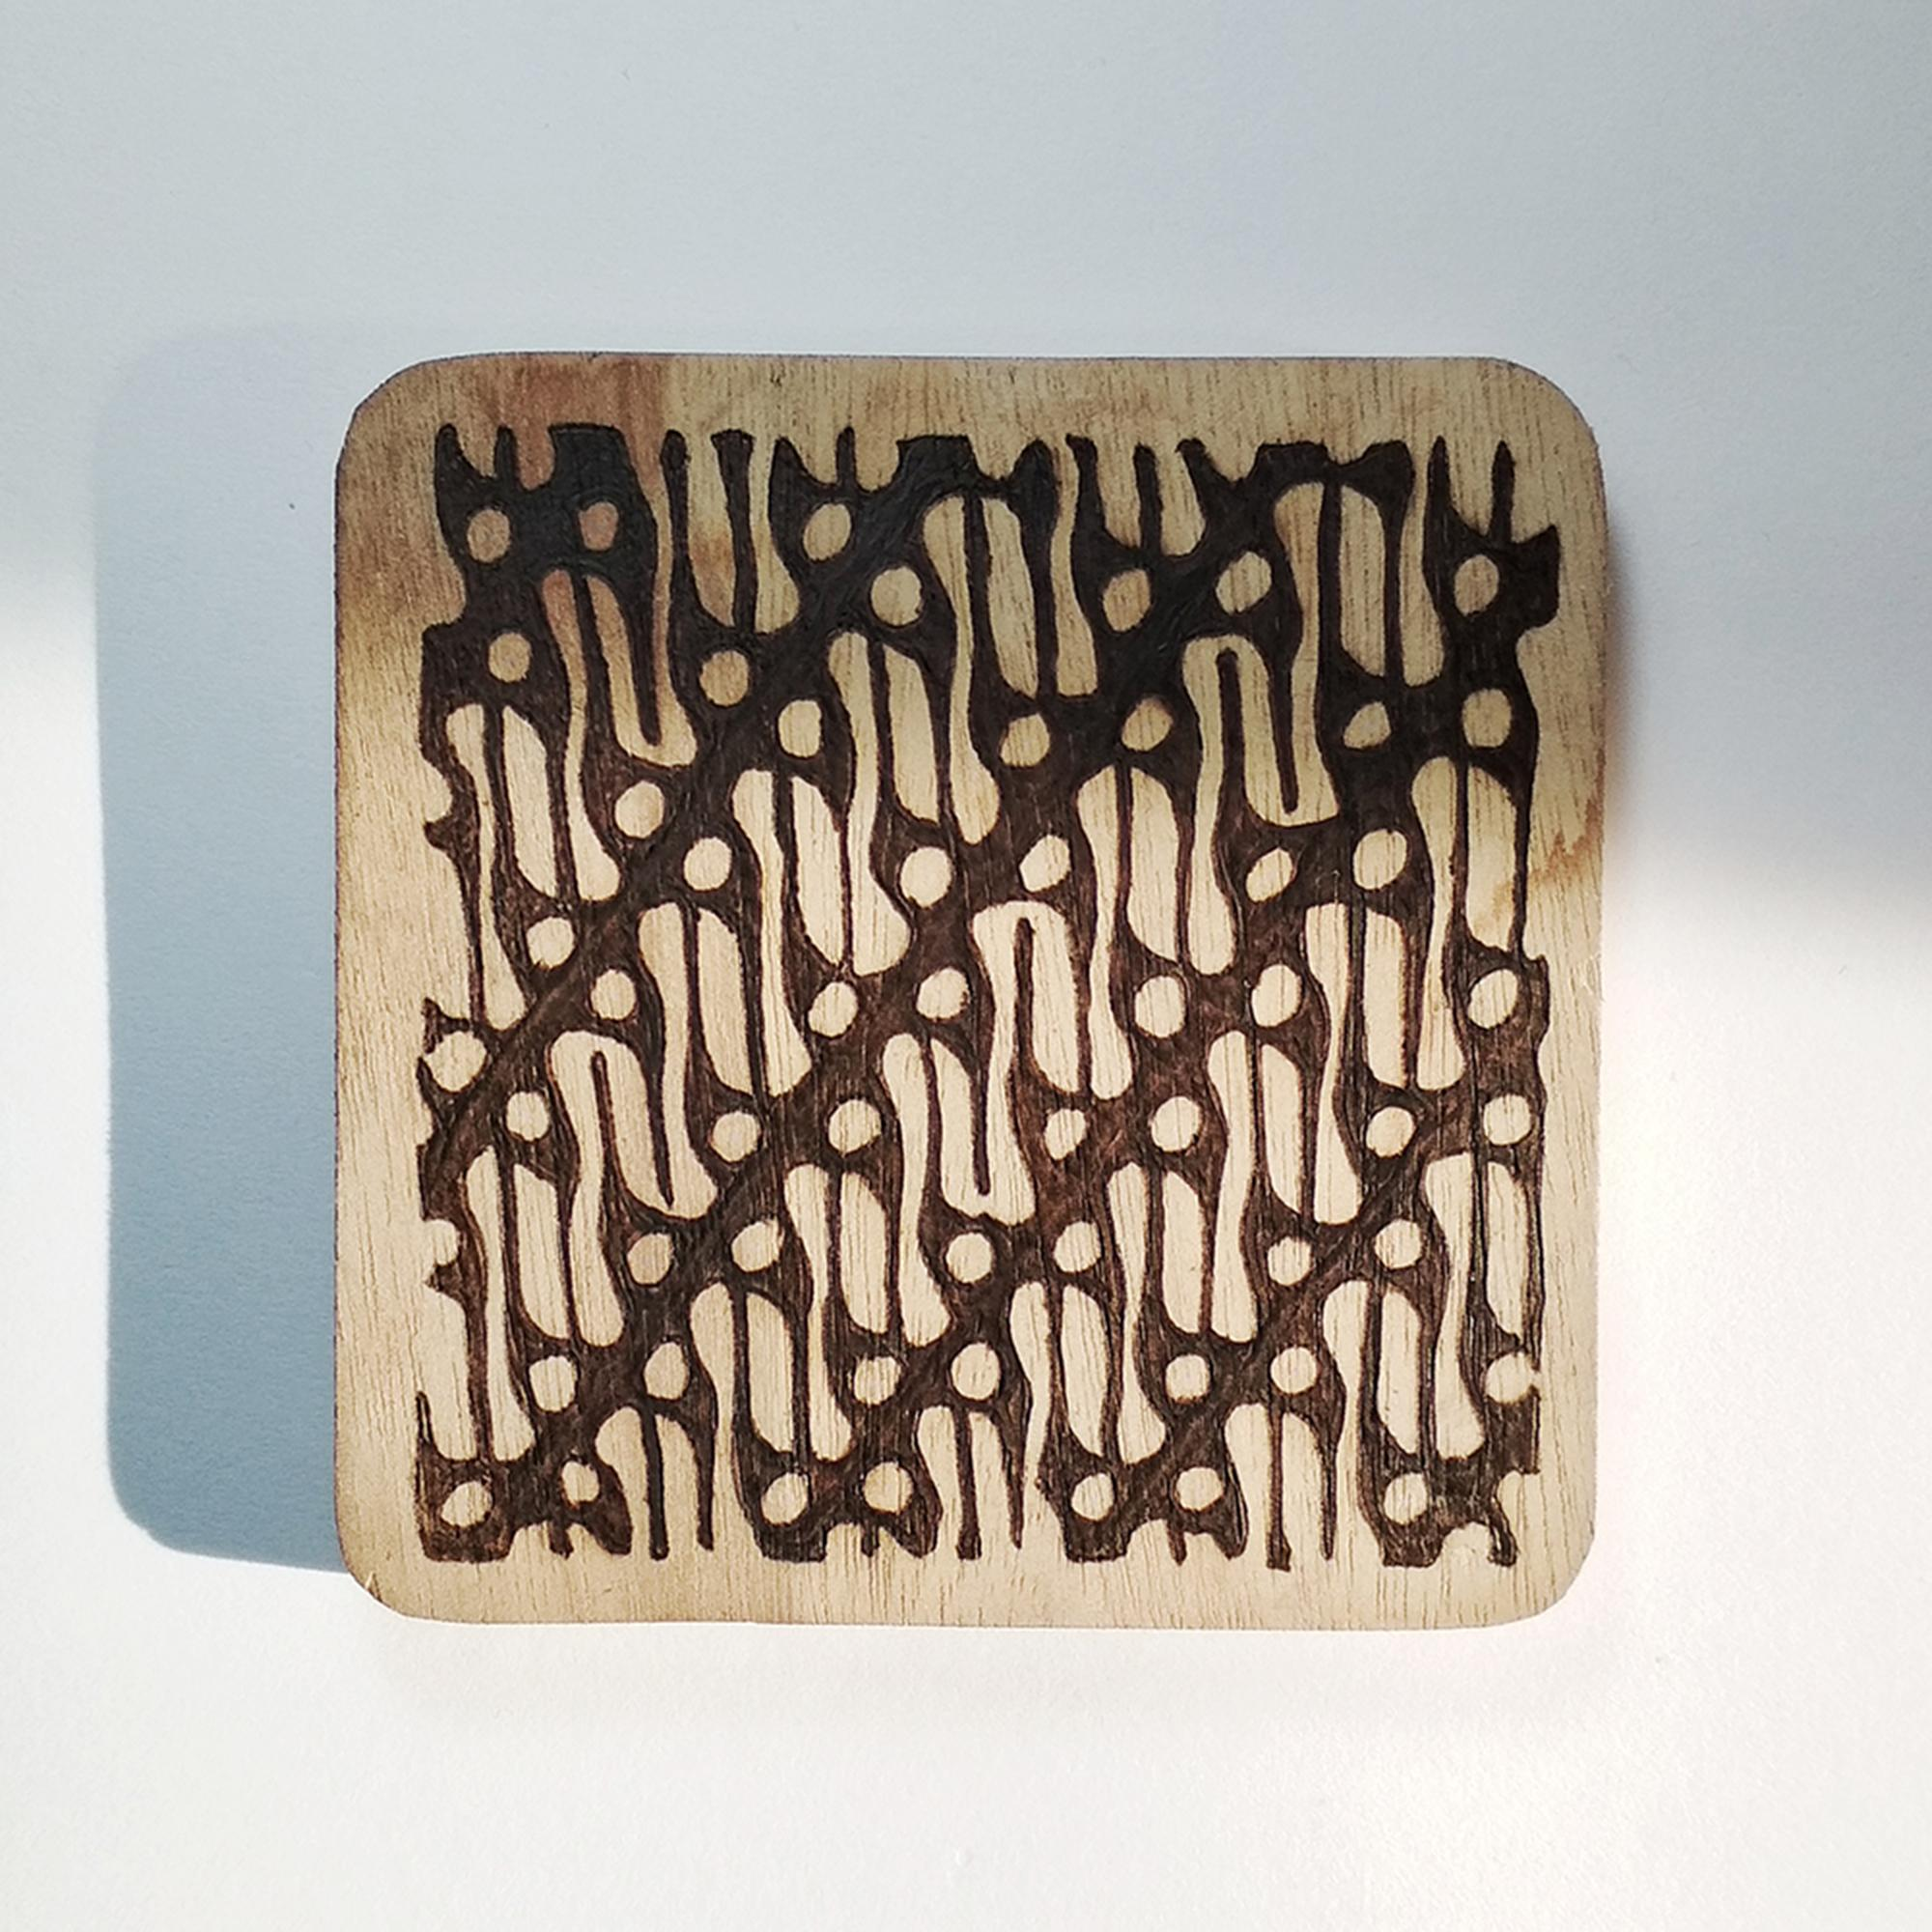 Nayoh - Tatakan Gelas Kayu Pyrography Motif Batik Parang